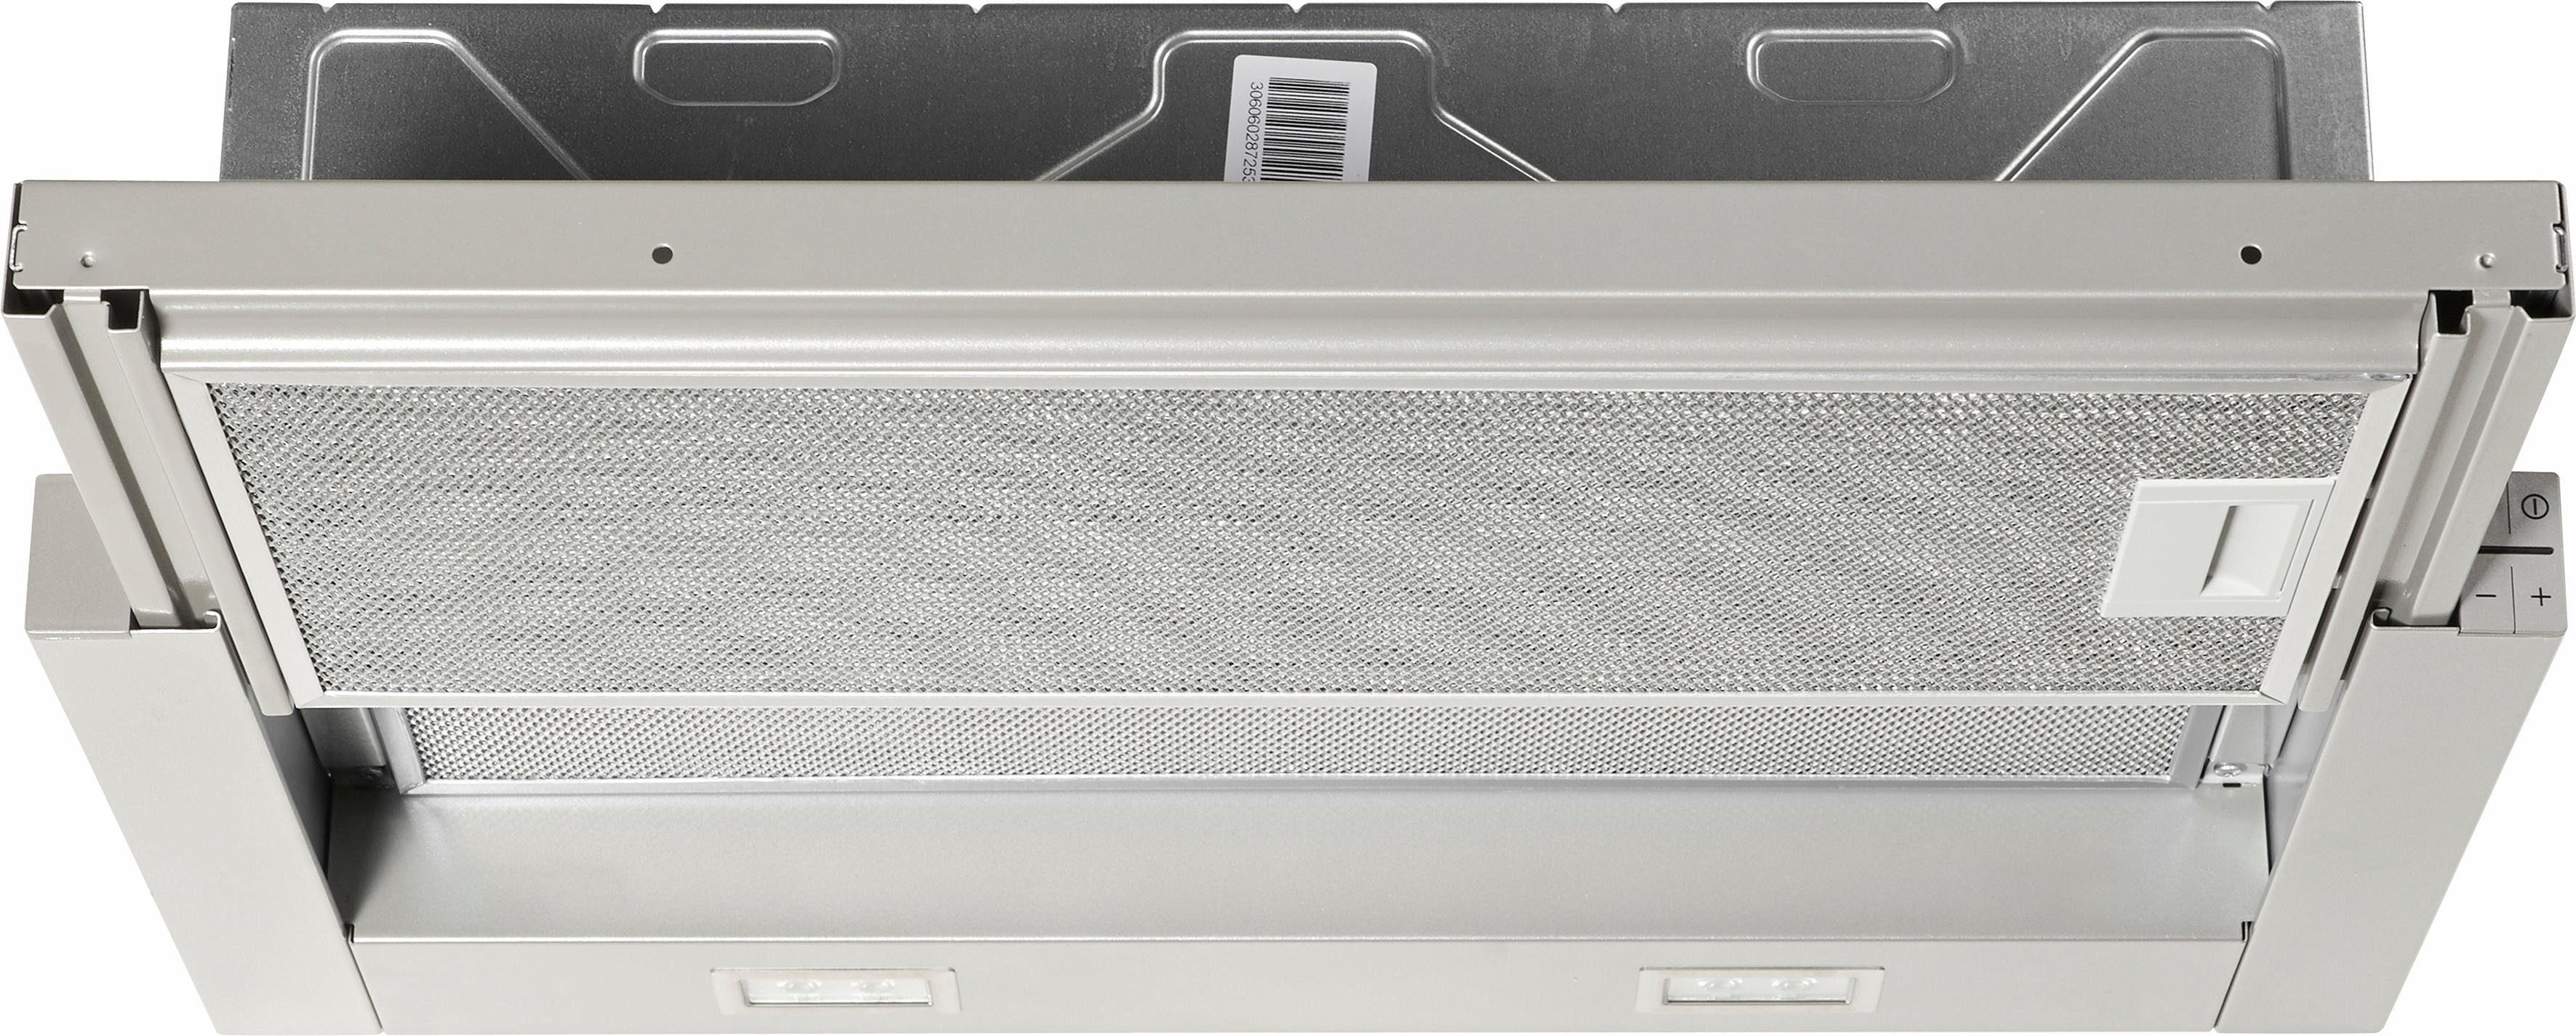 Bosch Flachschirmhaube DFL064A50